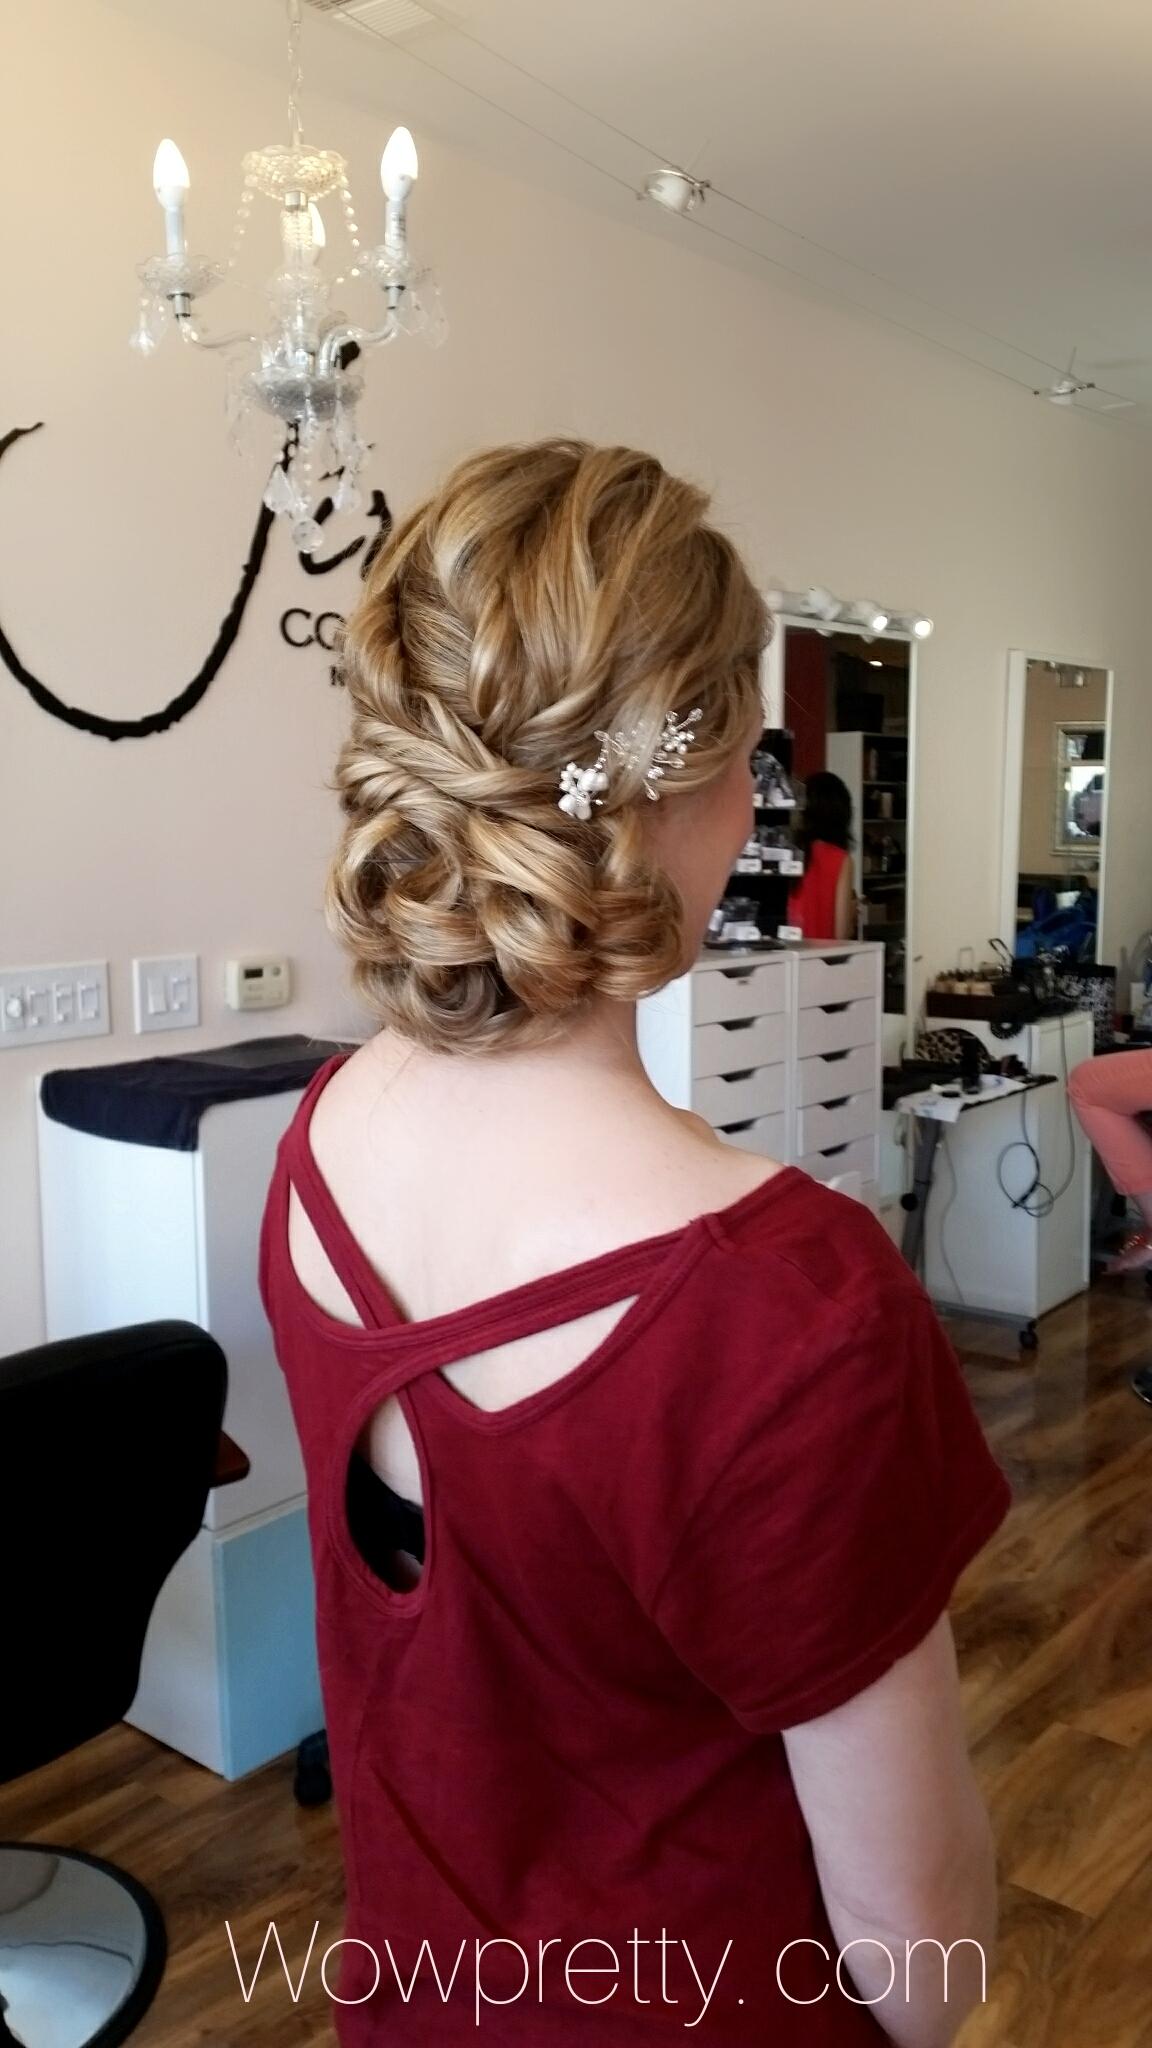 wedding-trial-makeup-and-hair_26646081270_o.jpg